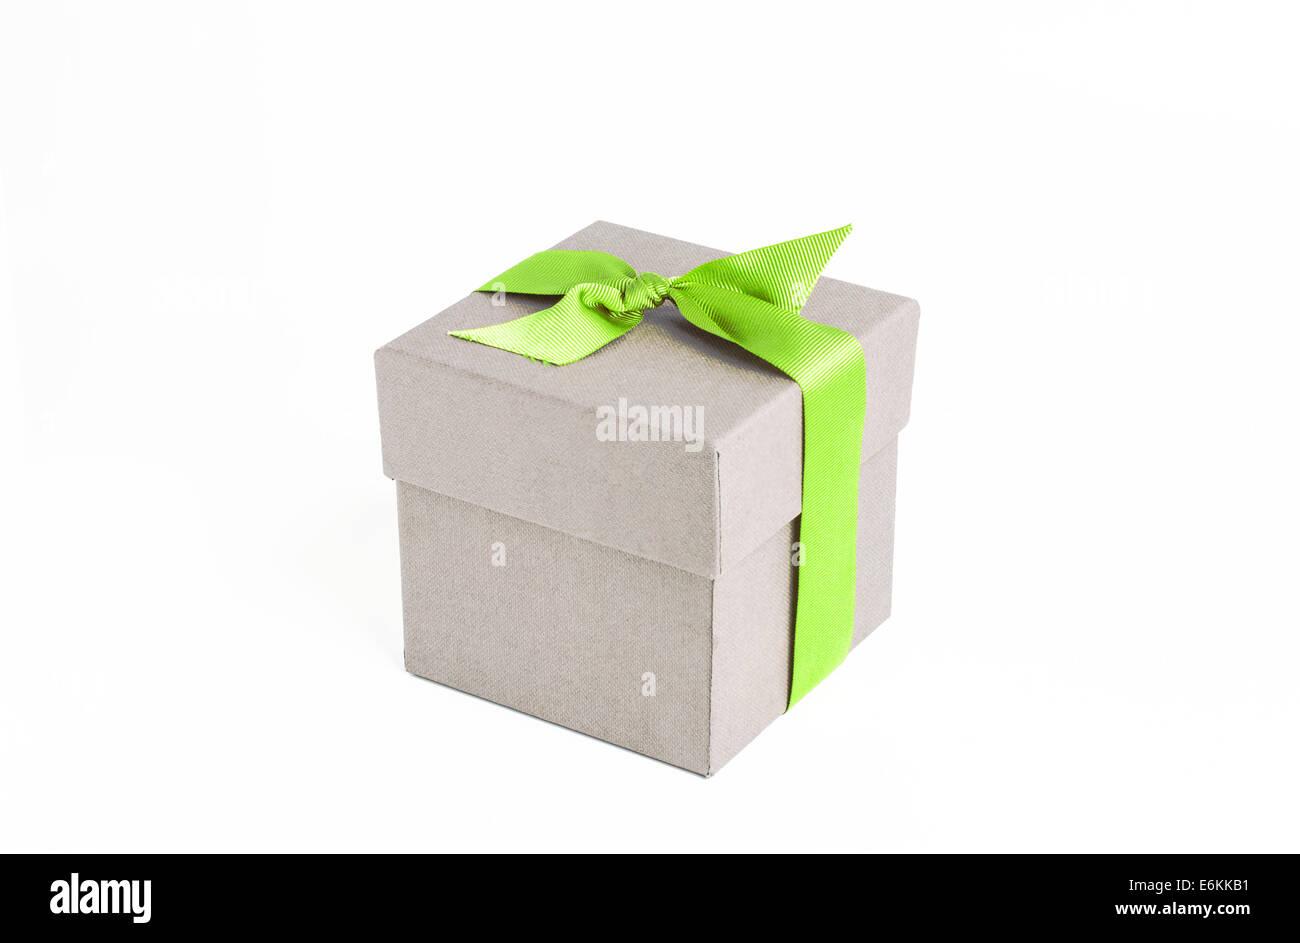 Caja de regalo con cinta verde Imagen De Stock